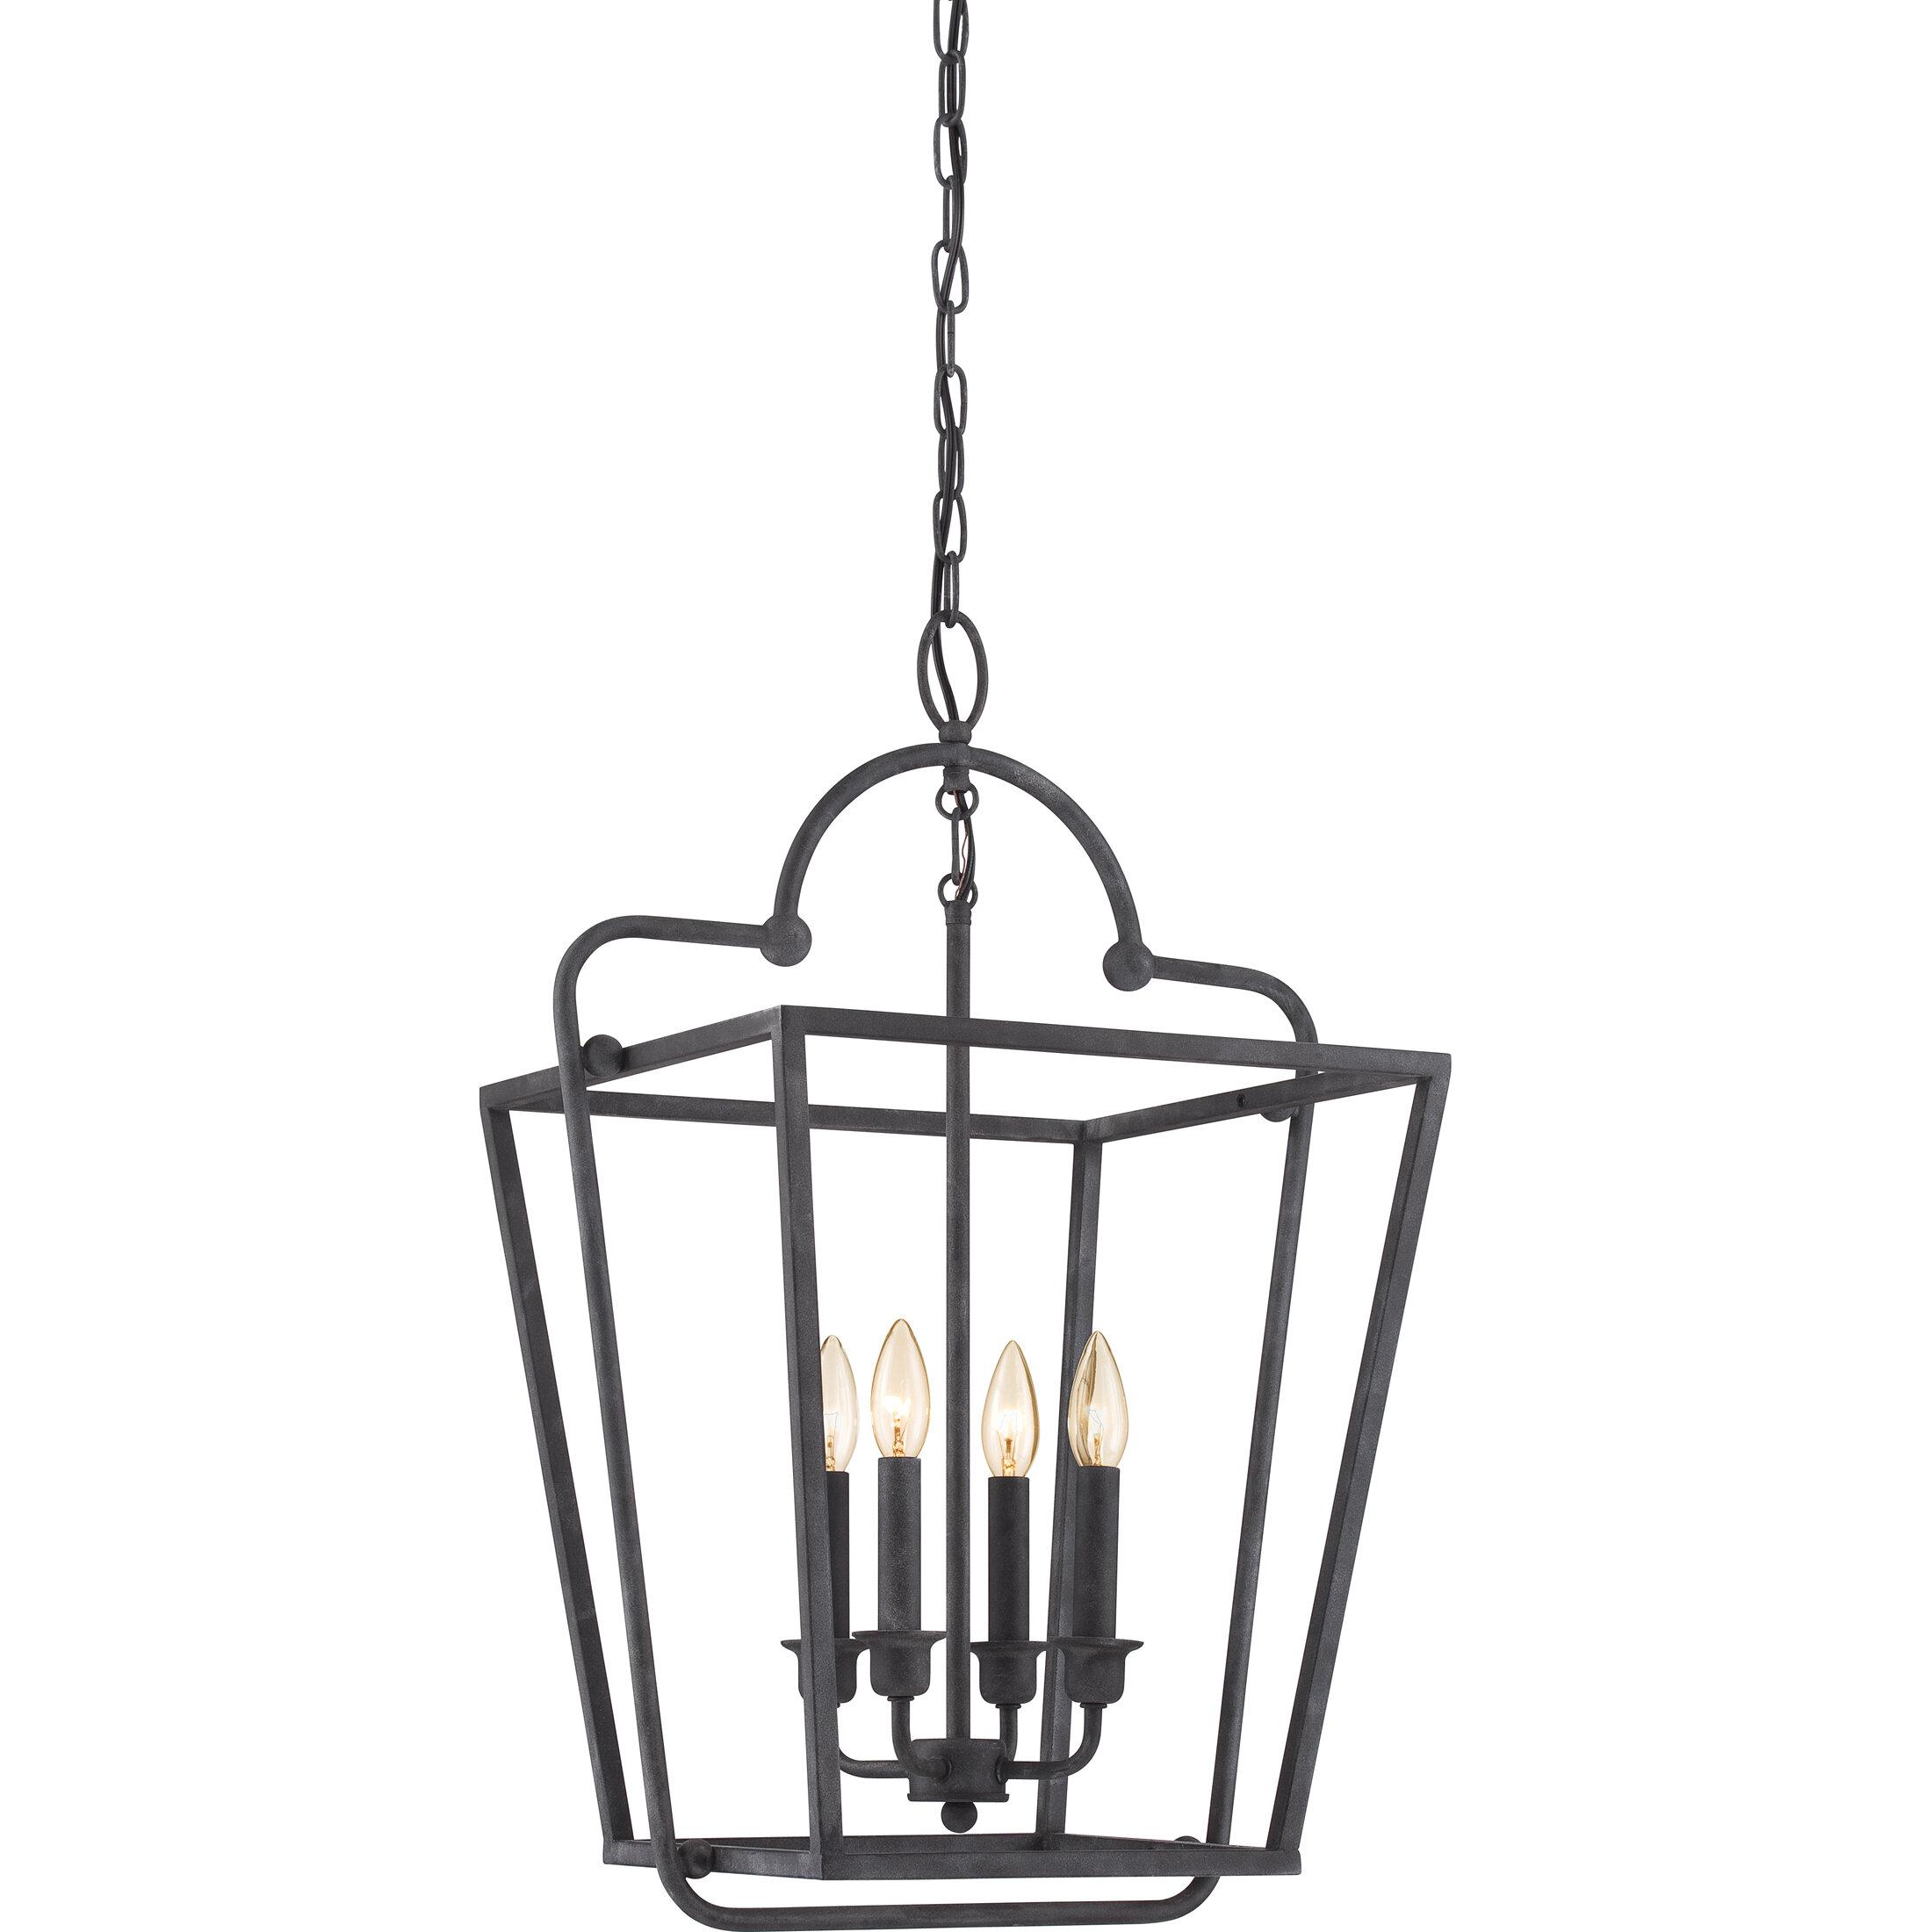 white foyer pendant lighting candle. Laurel Foundry Modern Farmhouse Celina 4-Light Foyer Pendant \u0026 Reviews | Wayfair White Lighting Candle D